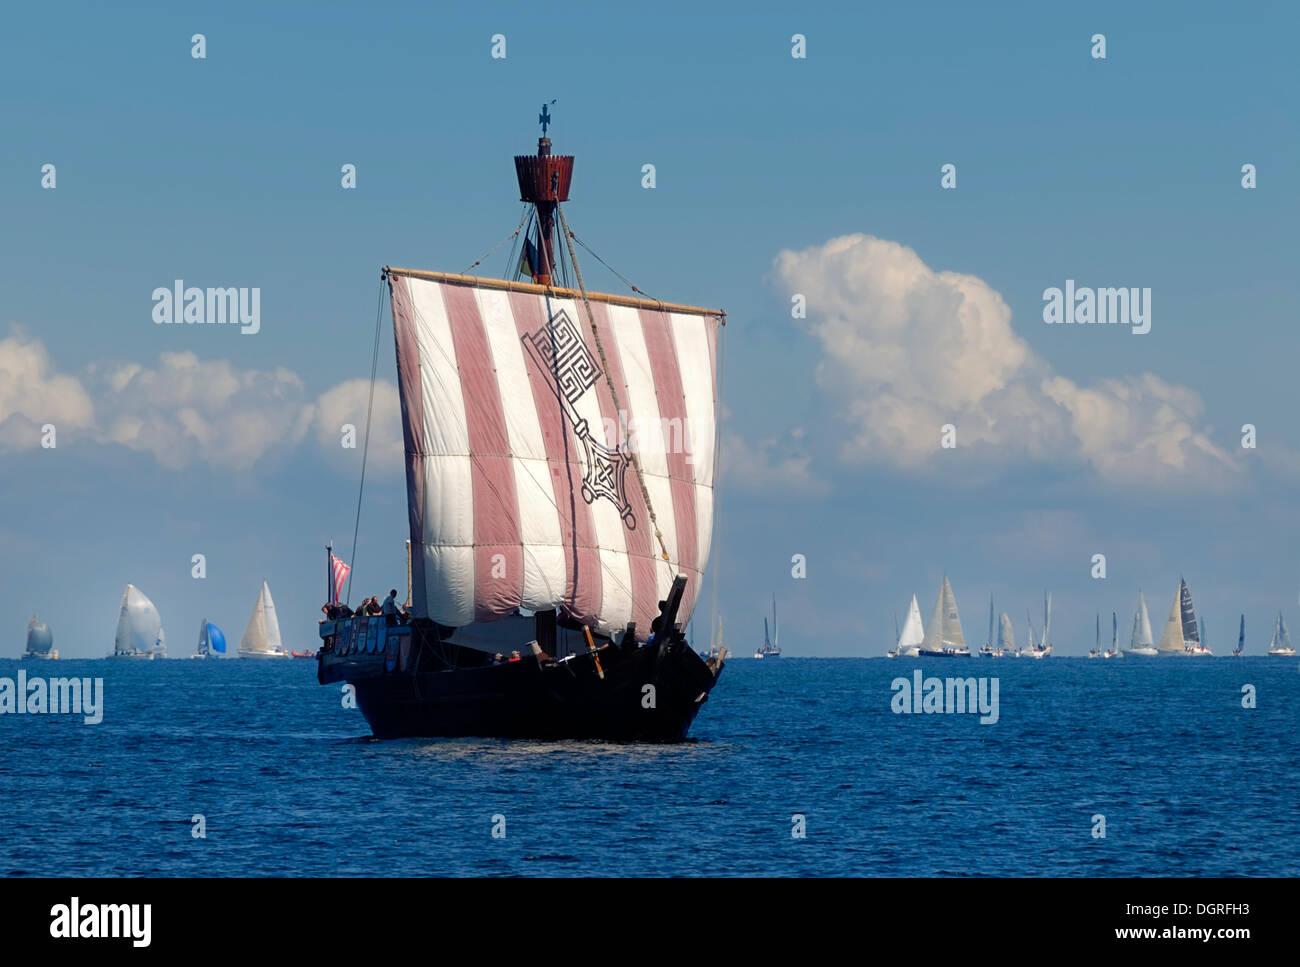 Hanse Kogge, Ubena von Bremen, replica of the Bremen cog ship, Kiel Week 2010, Kiel Fjord, Schleswig-Holstein - Stock Image